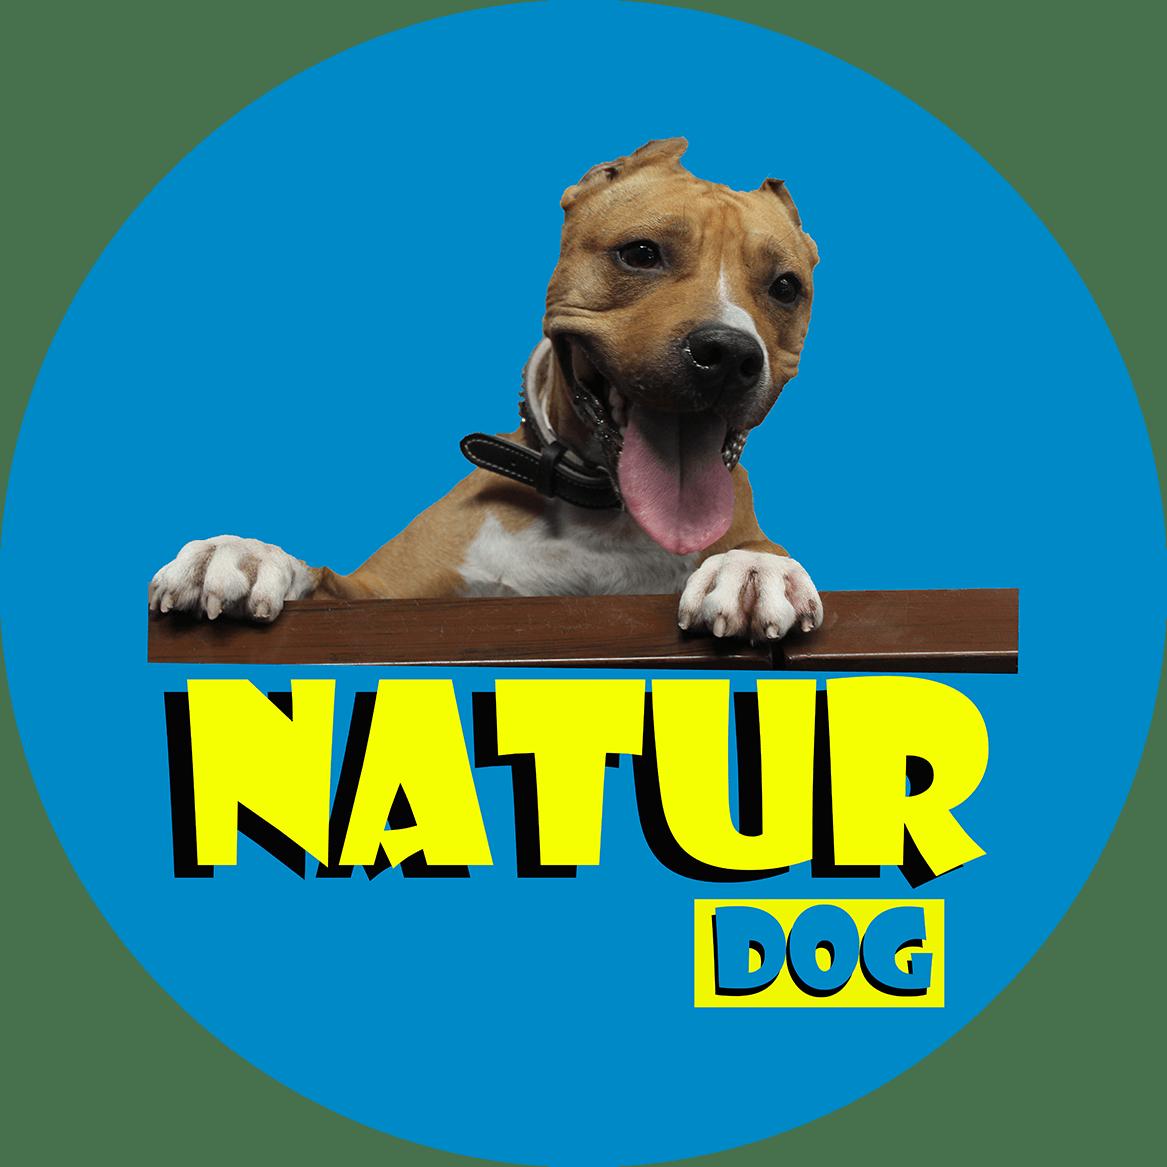 Naturdog